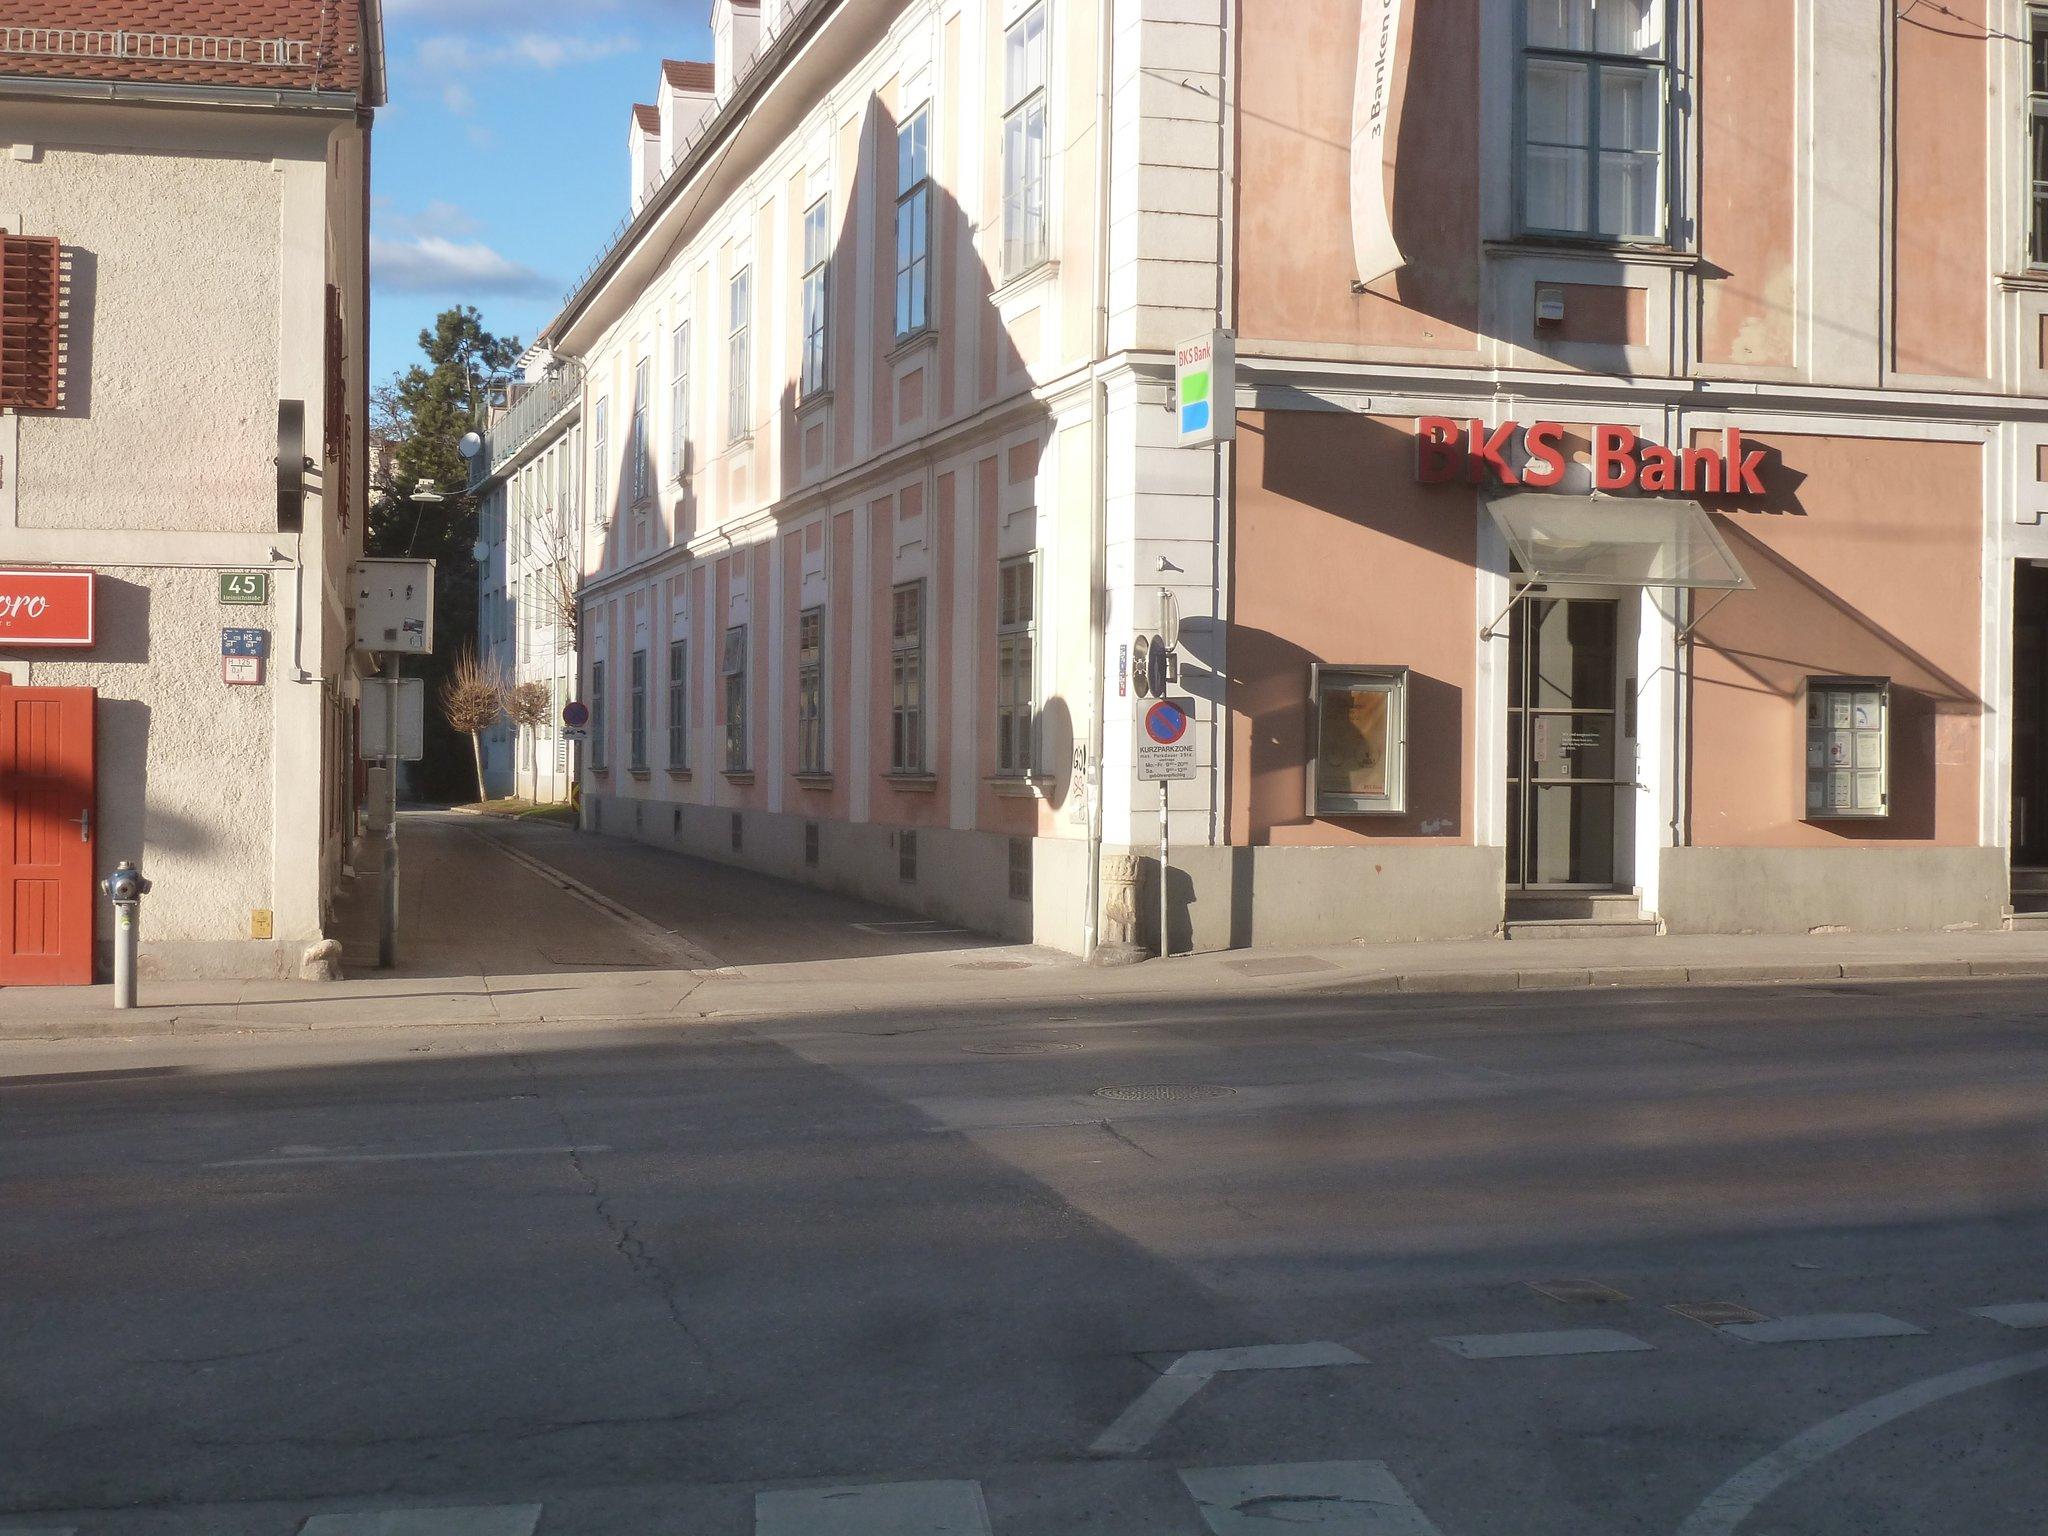 Sex Treffen Graz Geidorf, dating seiten Wien Hietzing